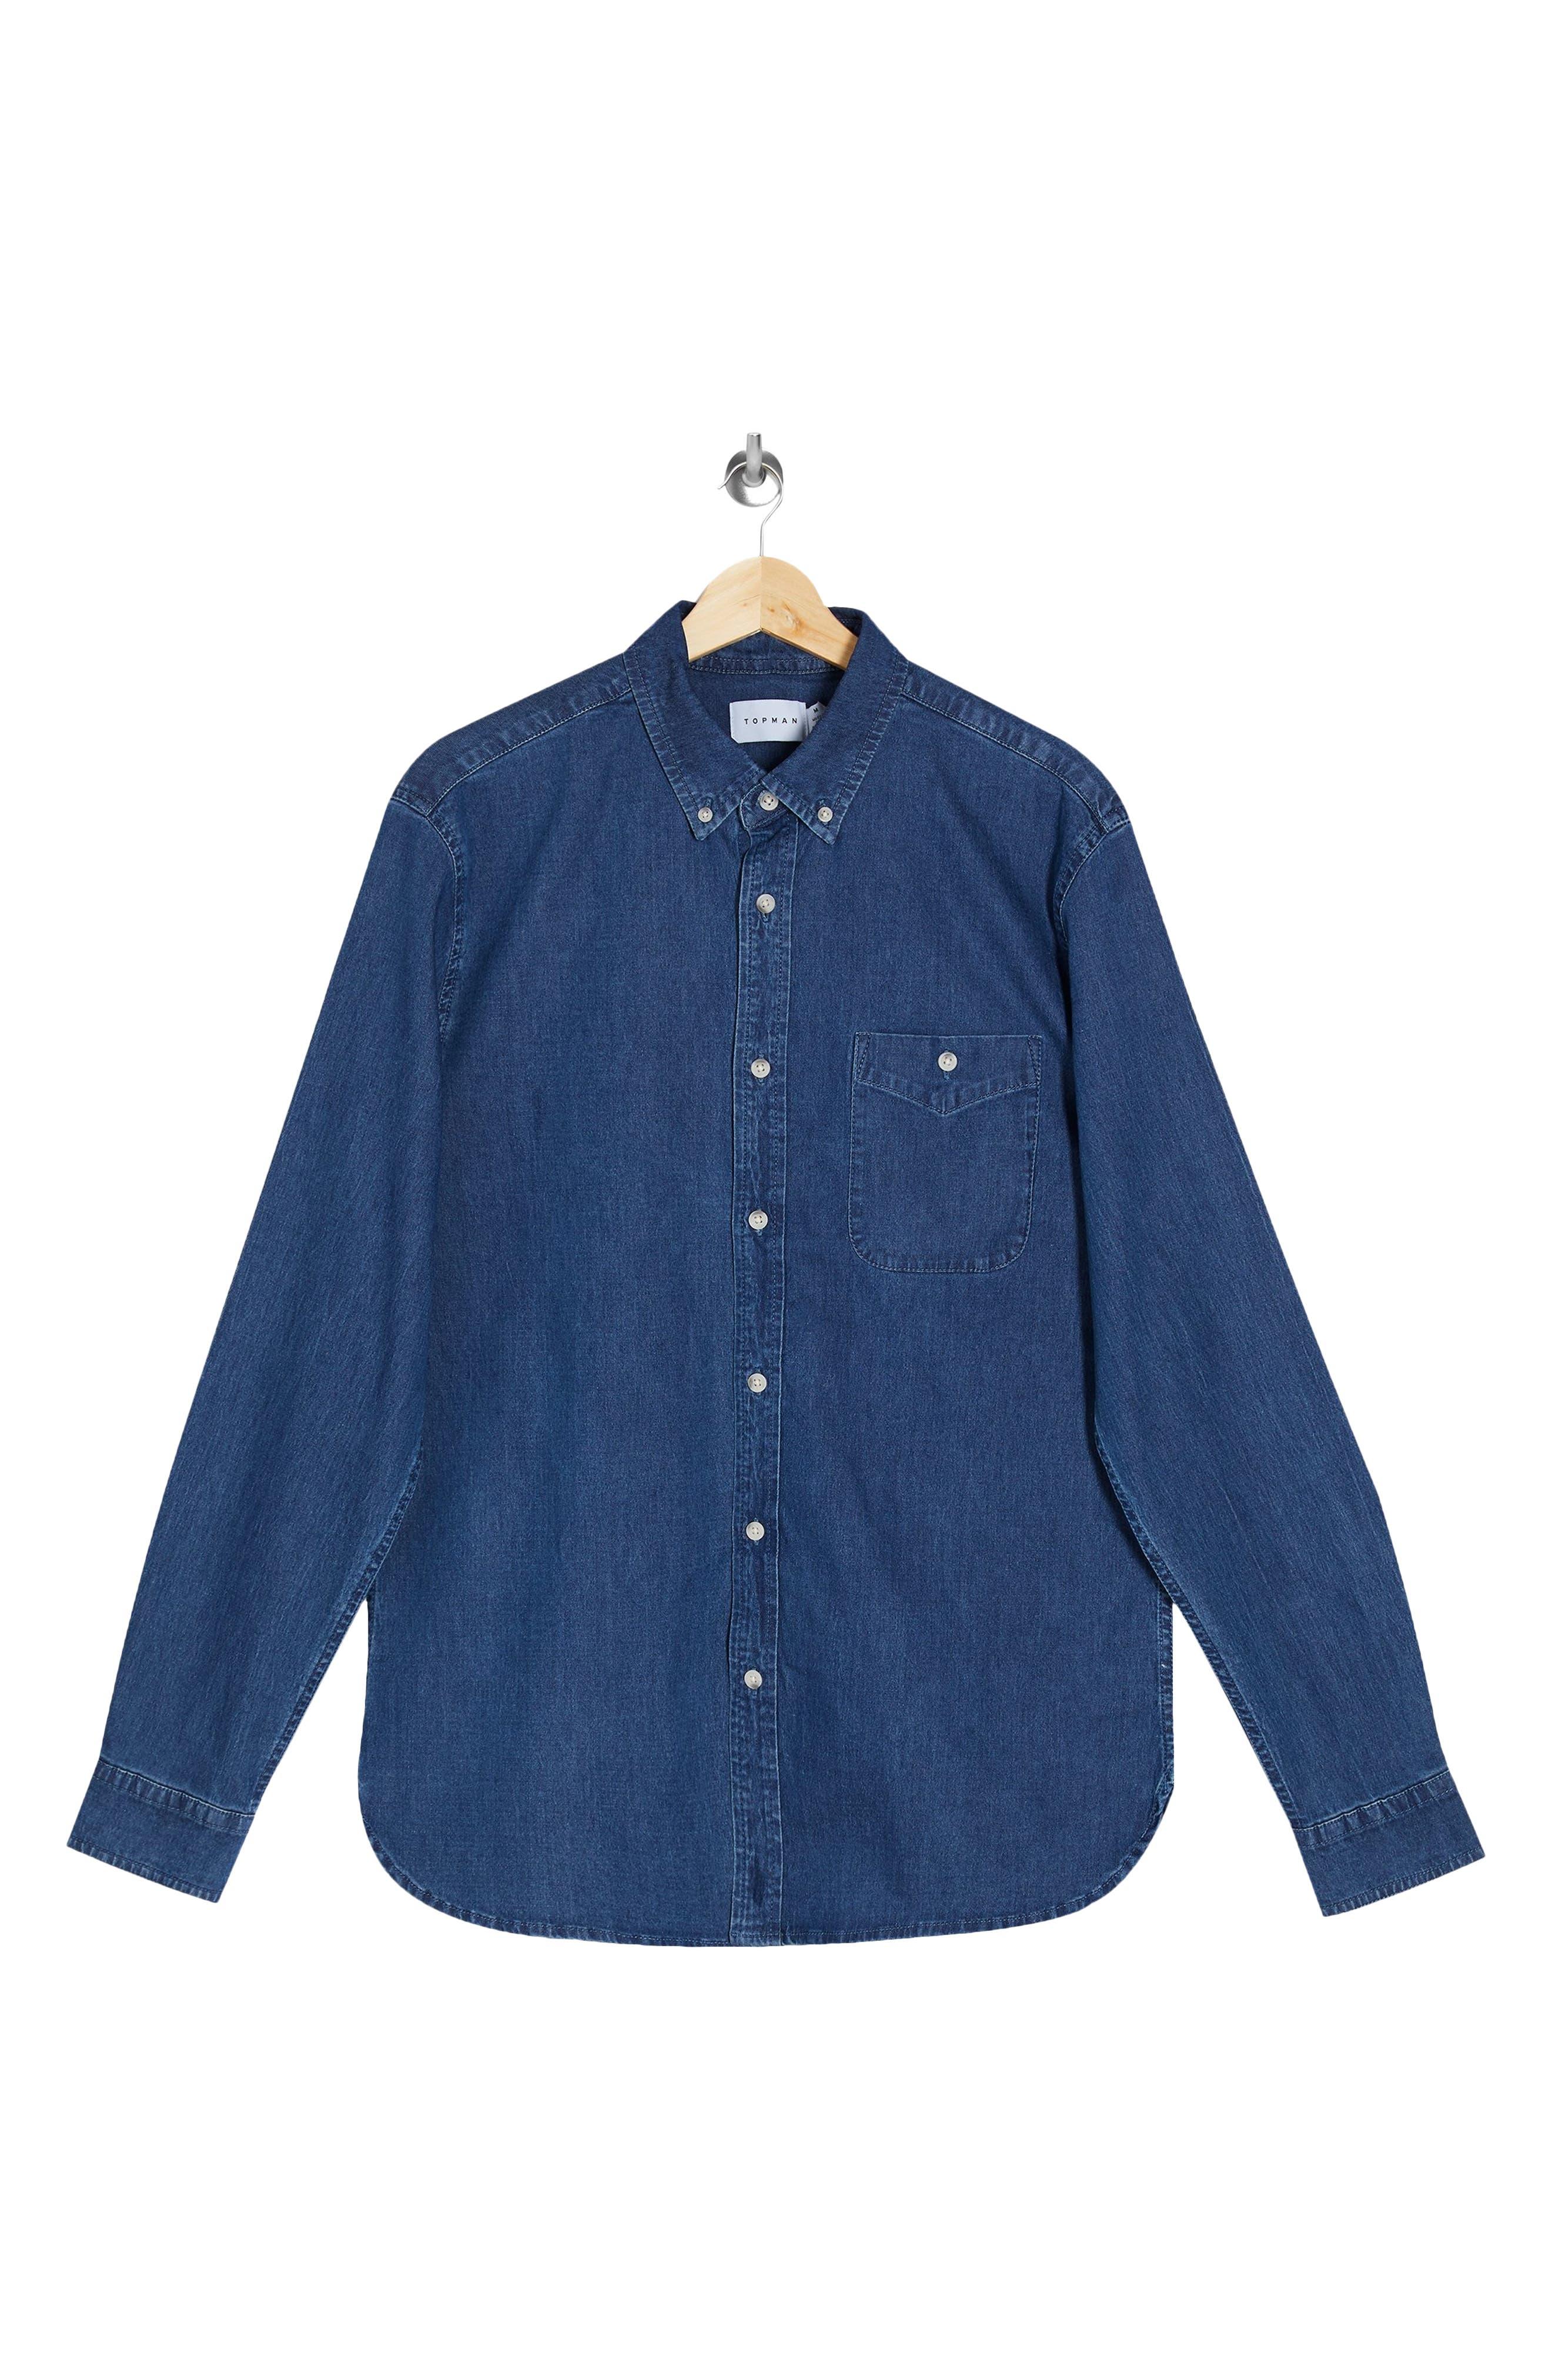 1960s Mens Shirts | 60s Mod Shirts, Hippie Shirts Mens Topman Mens Button-Down Stretch Denim Shirt Size XX-Large - Blue $33.00 AT vintagedancer.com